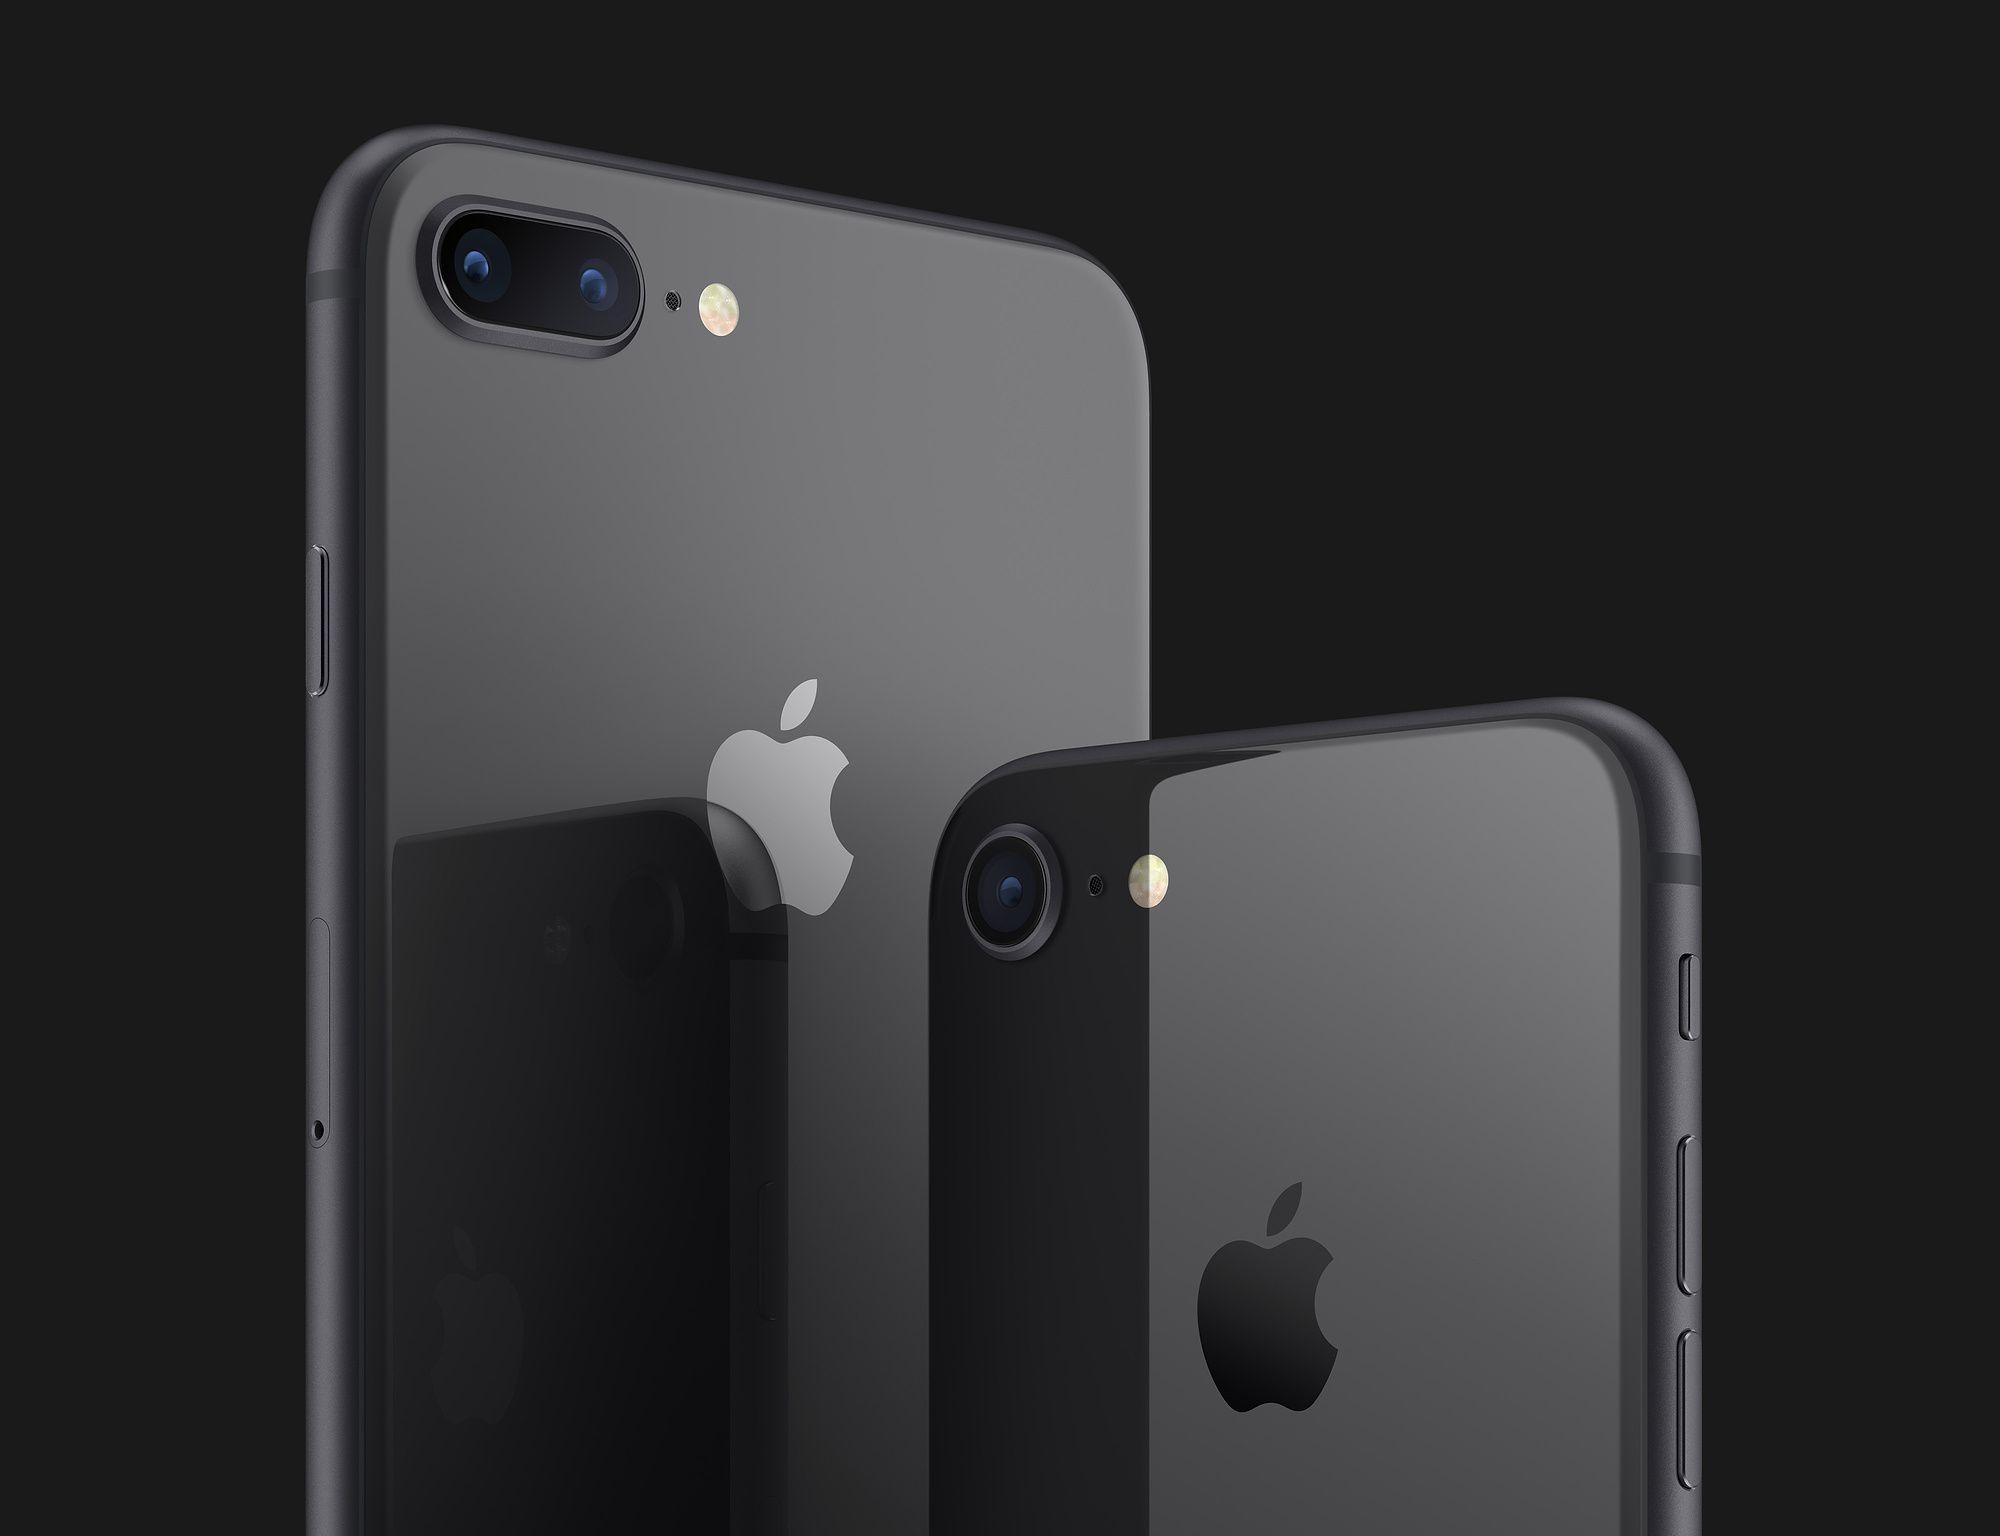 849 00 Sim Free 256gb Iphone 8 Plus Space Gray Apple Iphone 8 Plus Iphone Buy Iphone